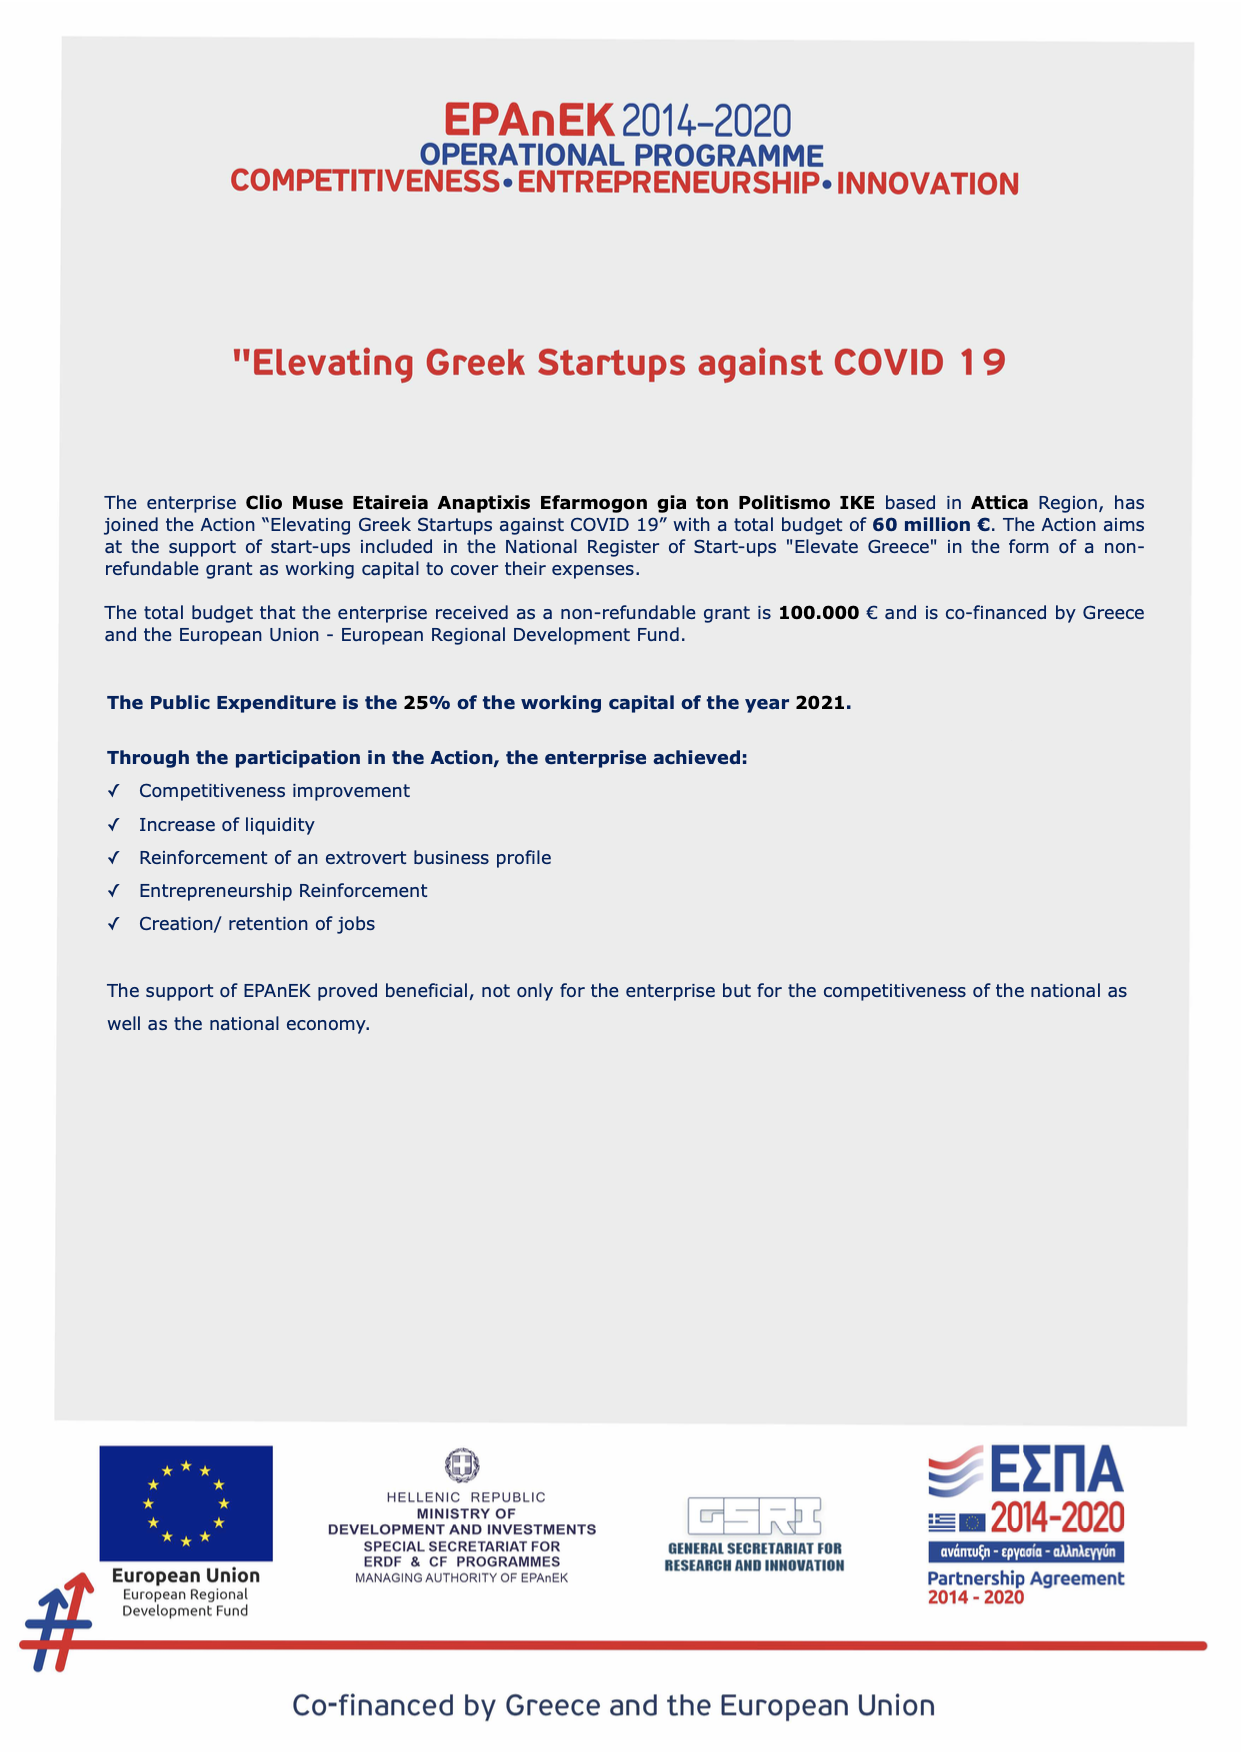 Elevating Greek Startups Against COVID-19